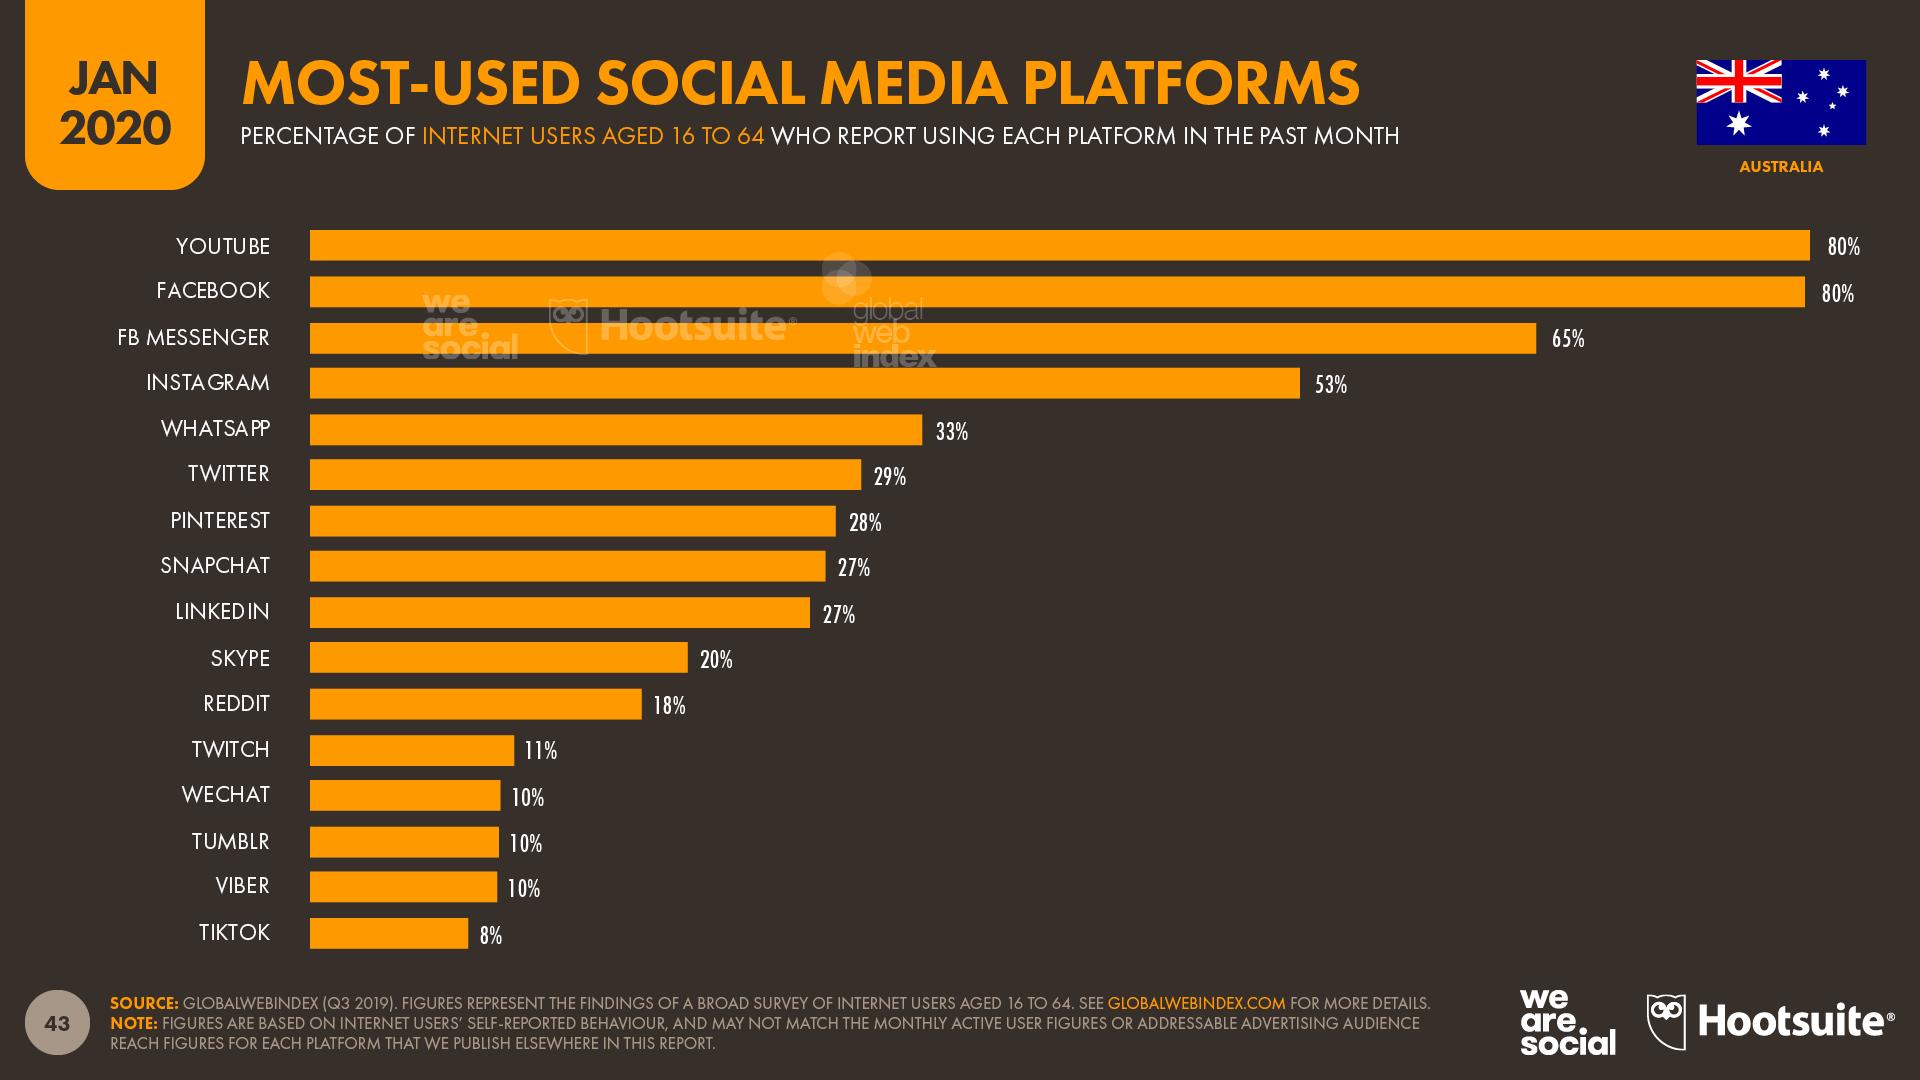 Digital 2020 in Australia: 1 in 3 minutes online are spent ...